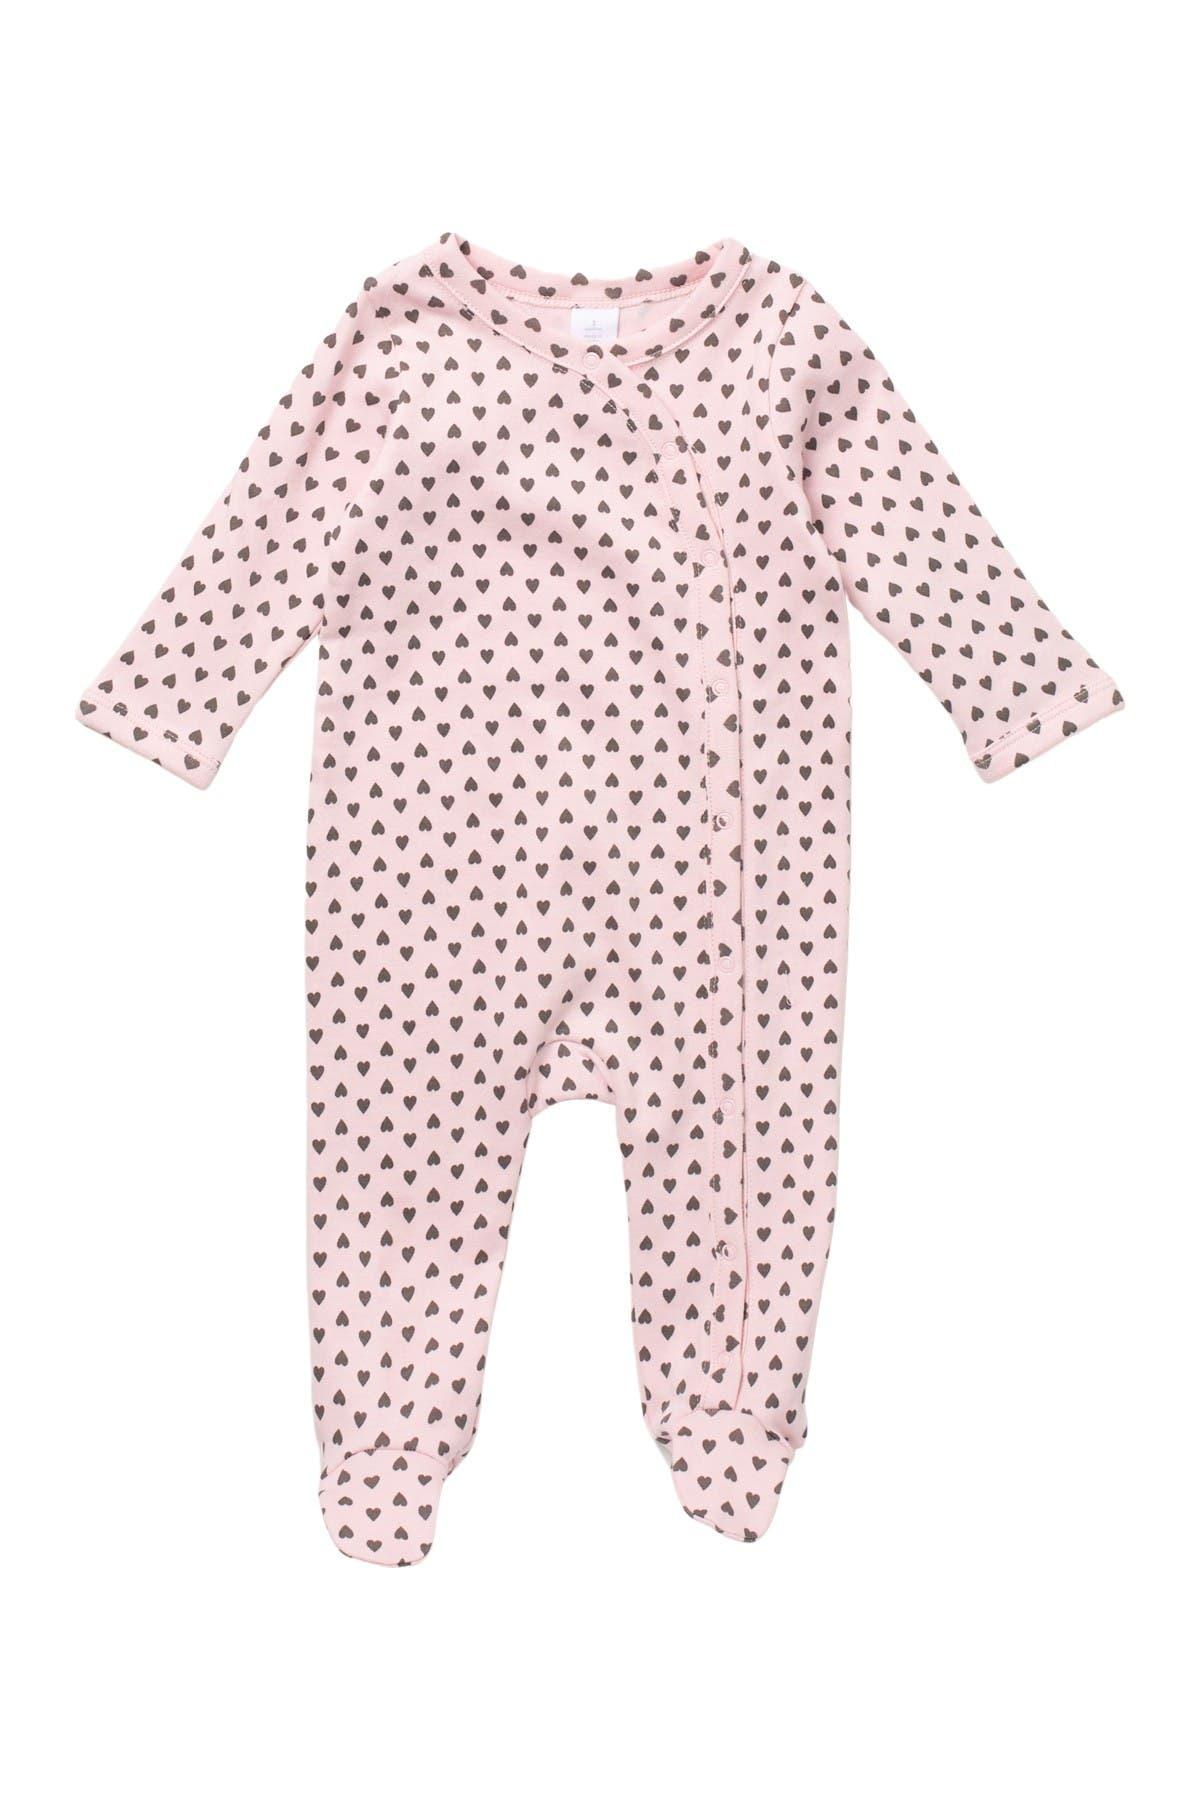 Nwada Unisex Baby Clothes Newborn Girl Zipper Romper Boys Bodysuit Toddler Sleepsuit Autumn Warm Pajamas 3-18 Months